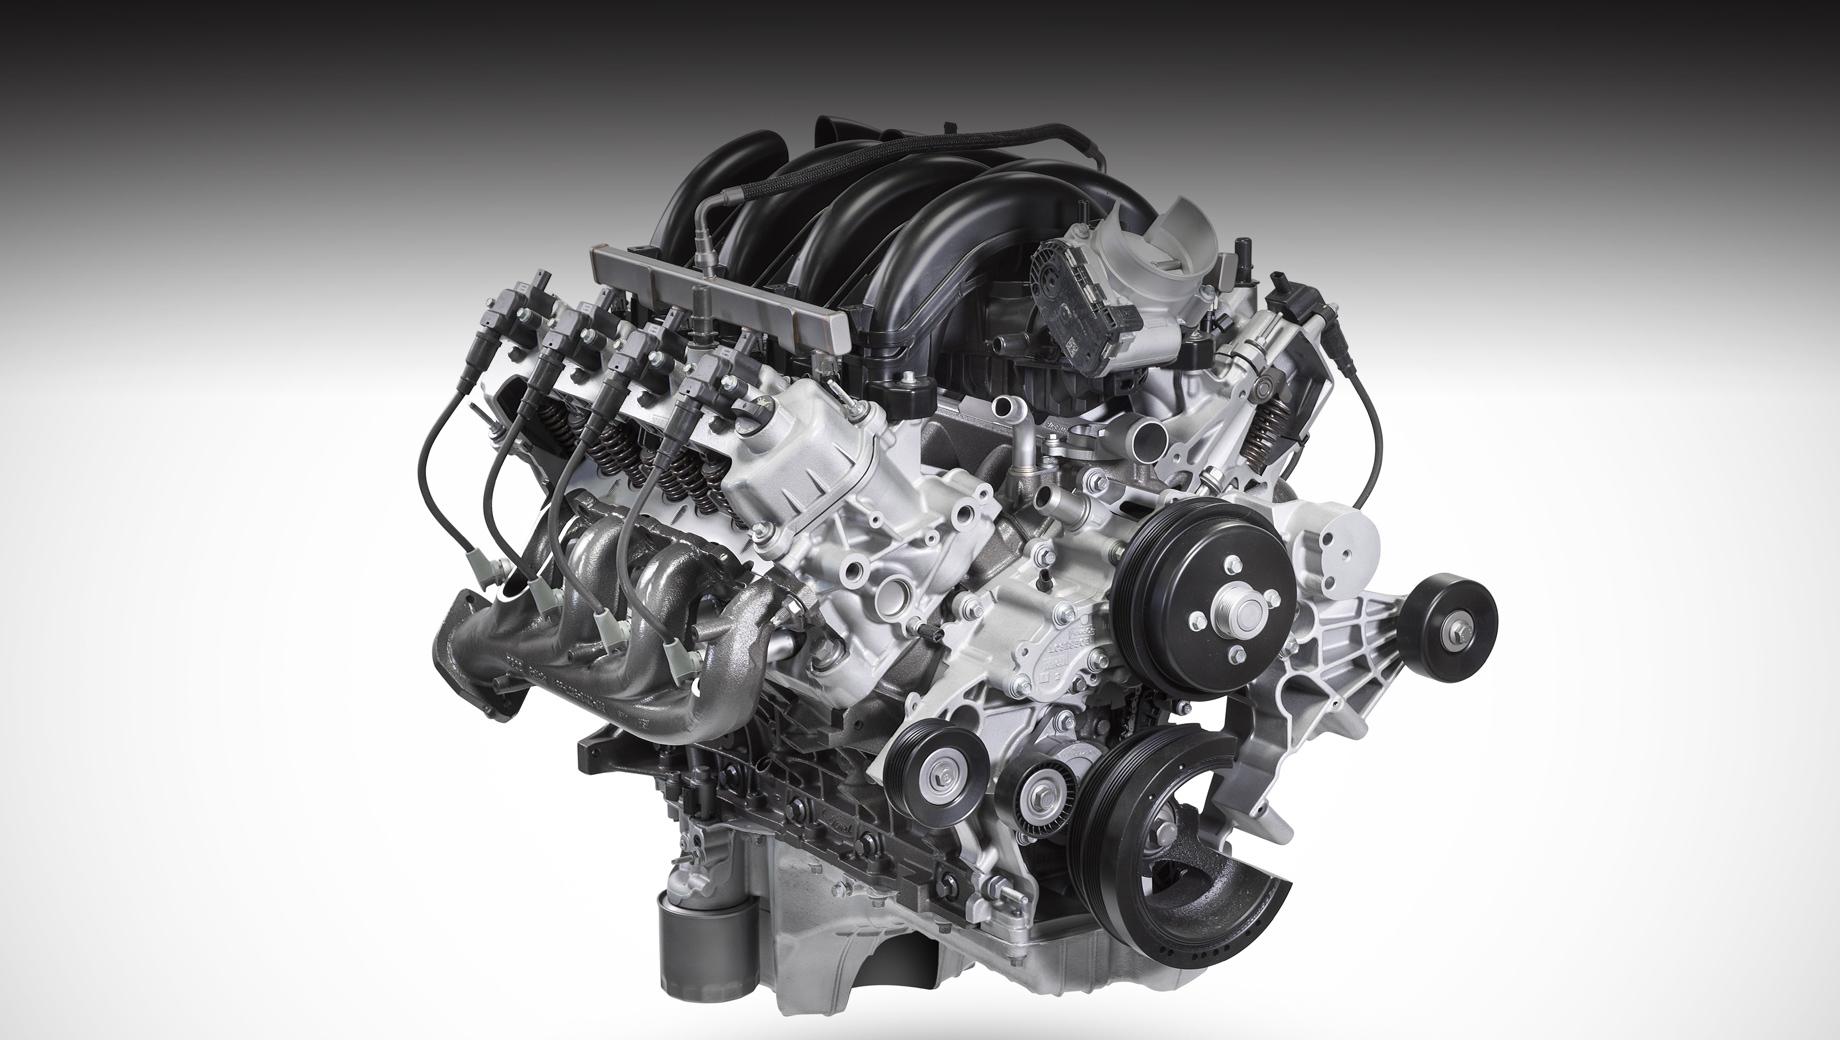 Гигант Ford V8 7.3 Godzilla стал «коробочным» мотором